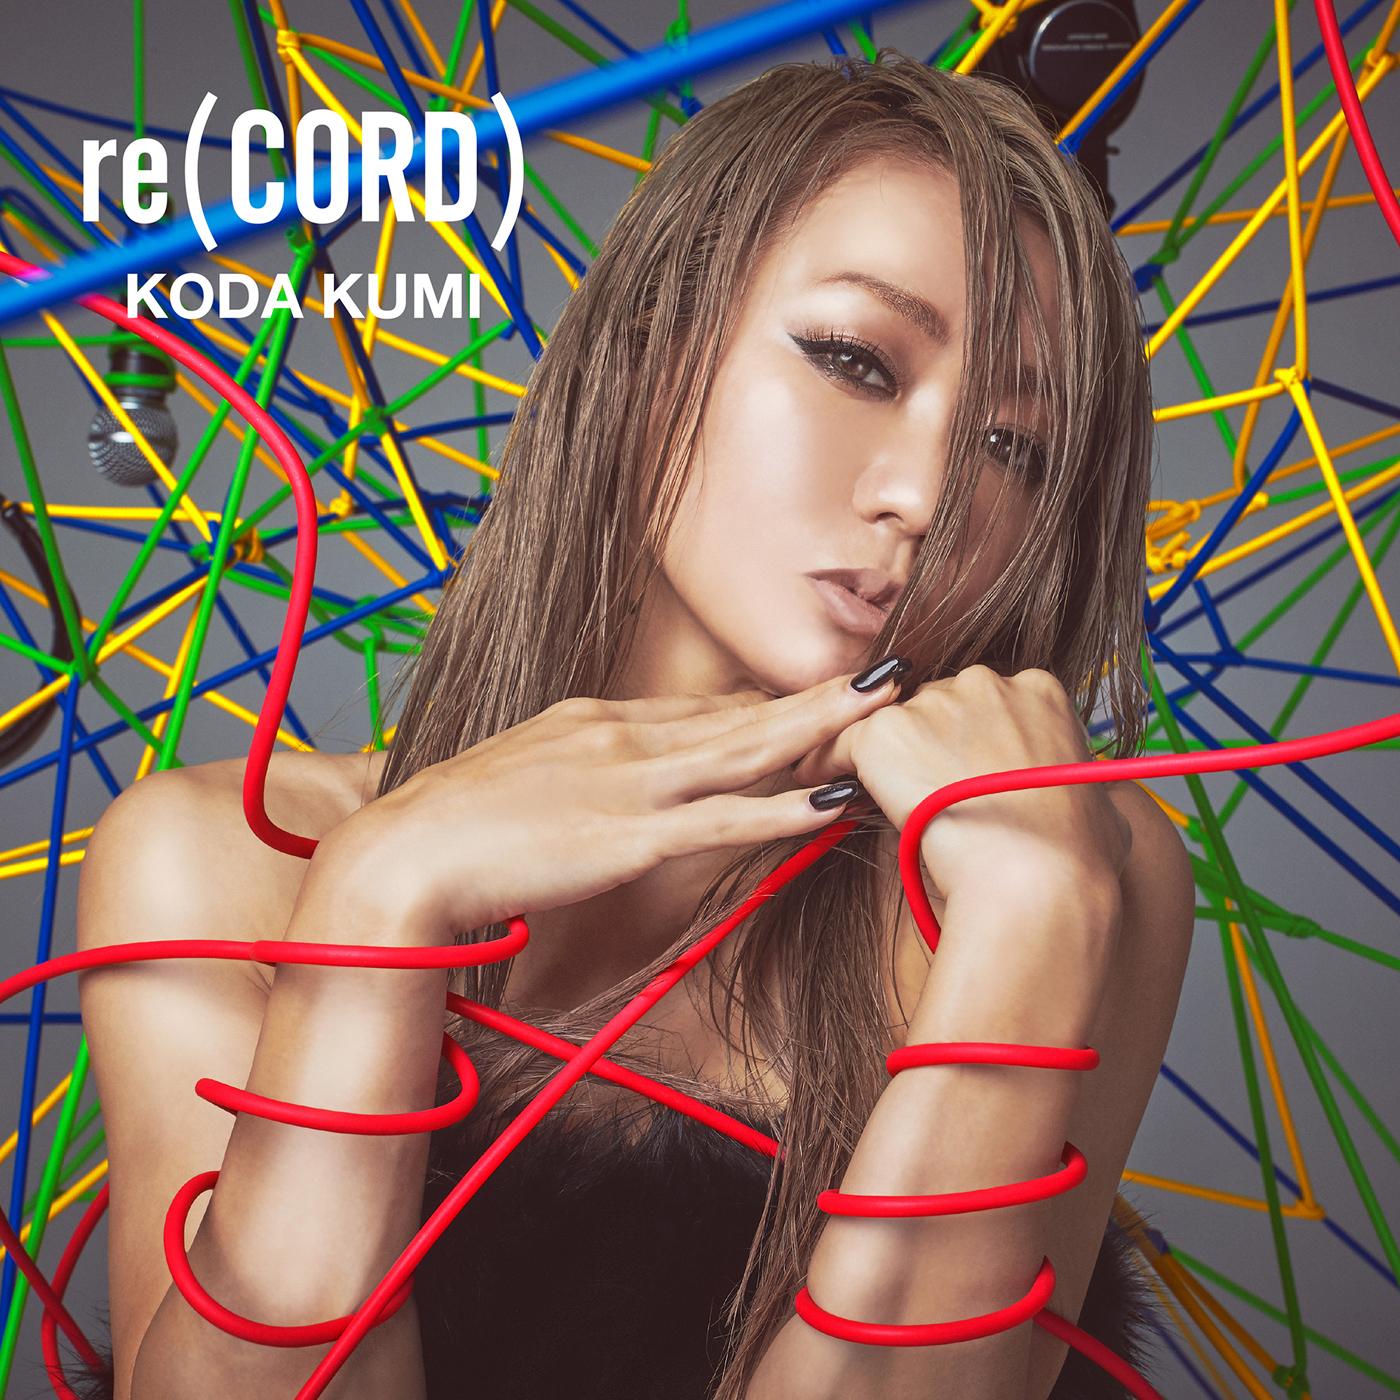 File:Koda Kumi - re(CORD) CD.jpg